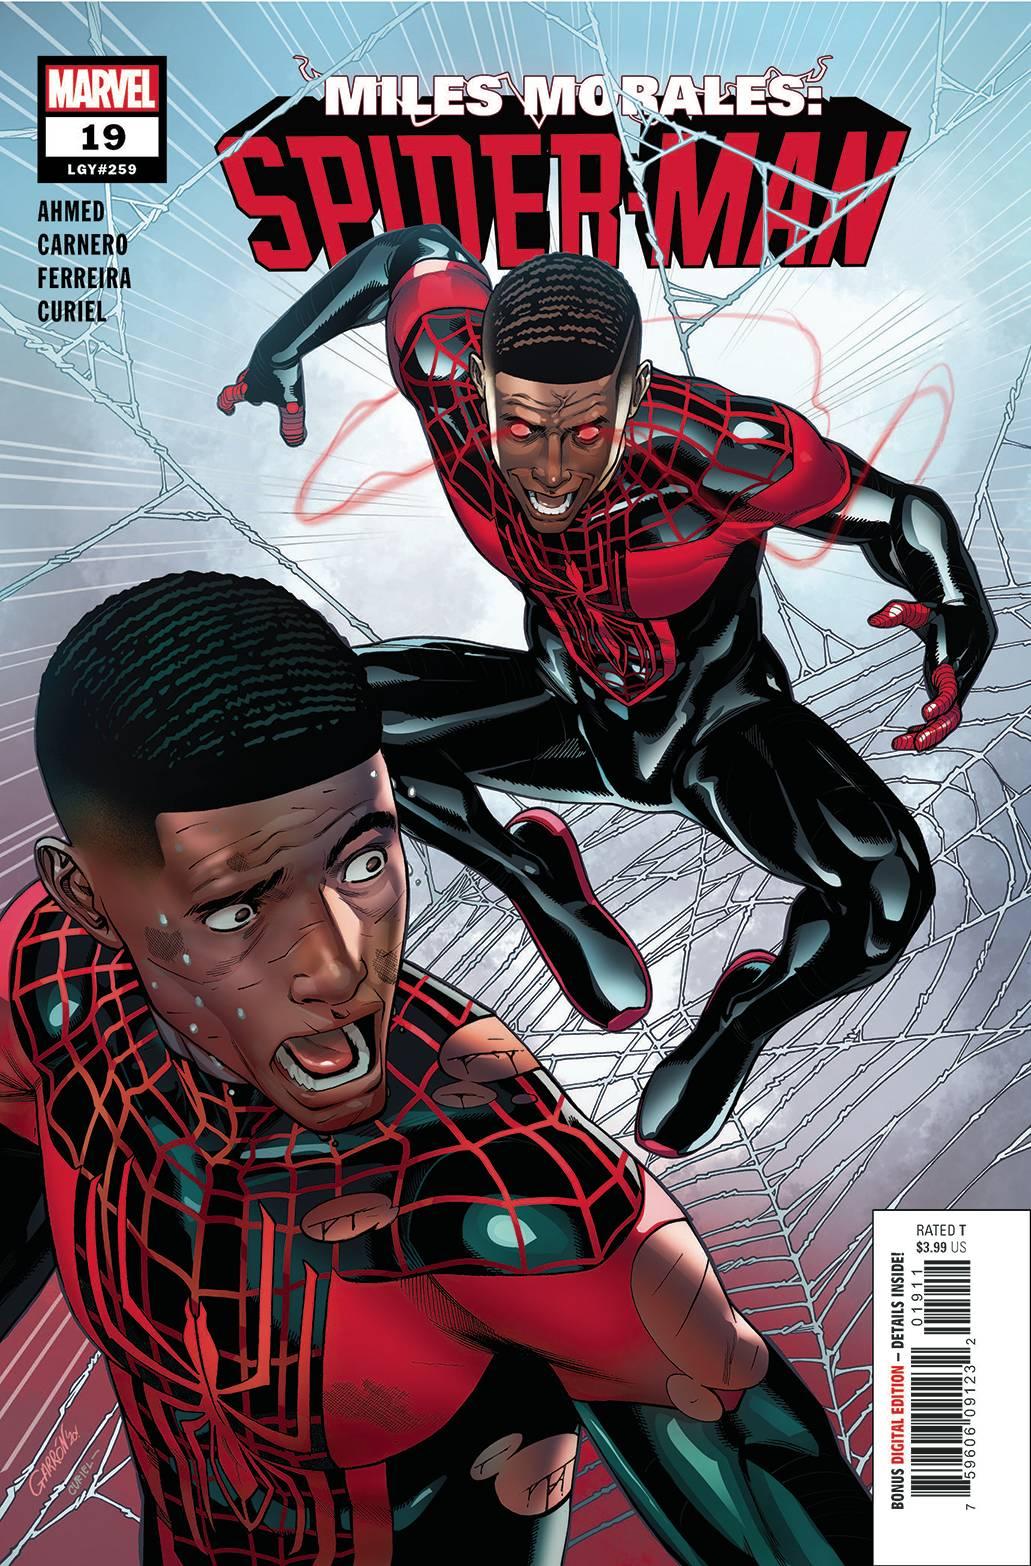 Miles Morales Spider-Man #19